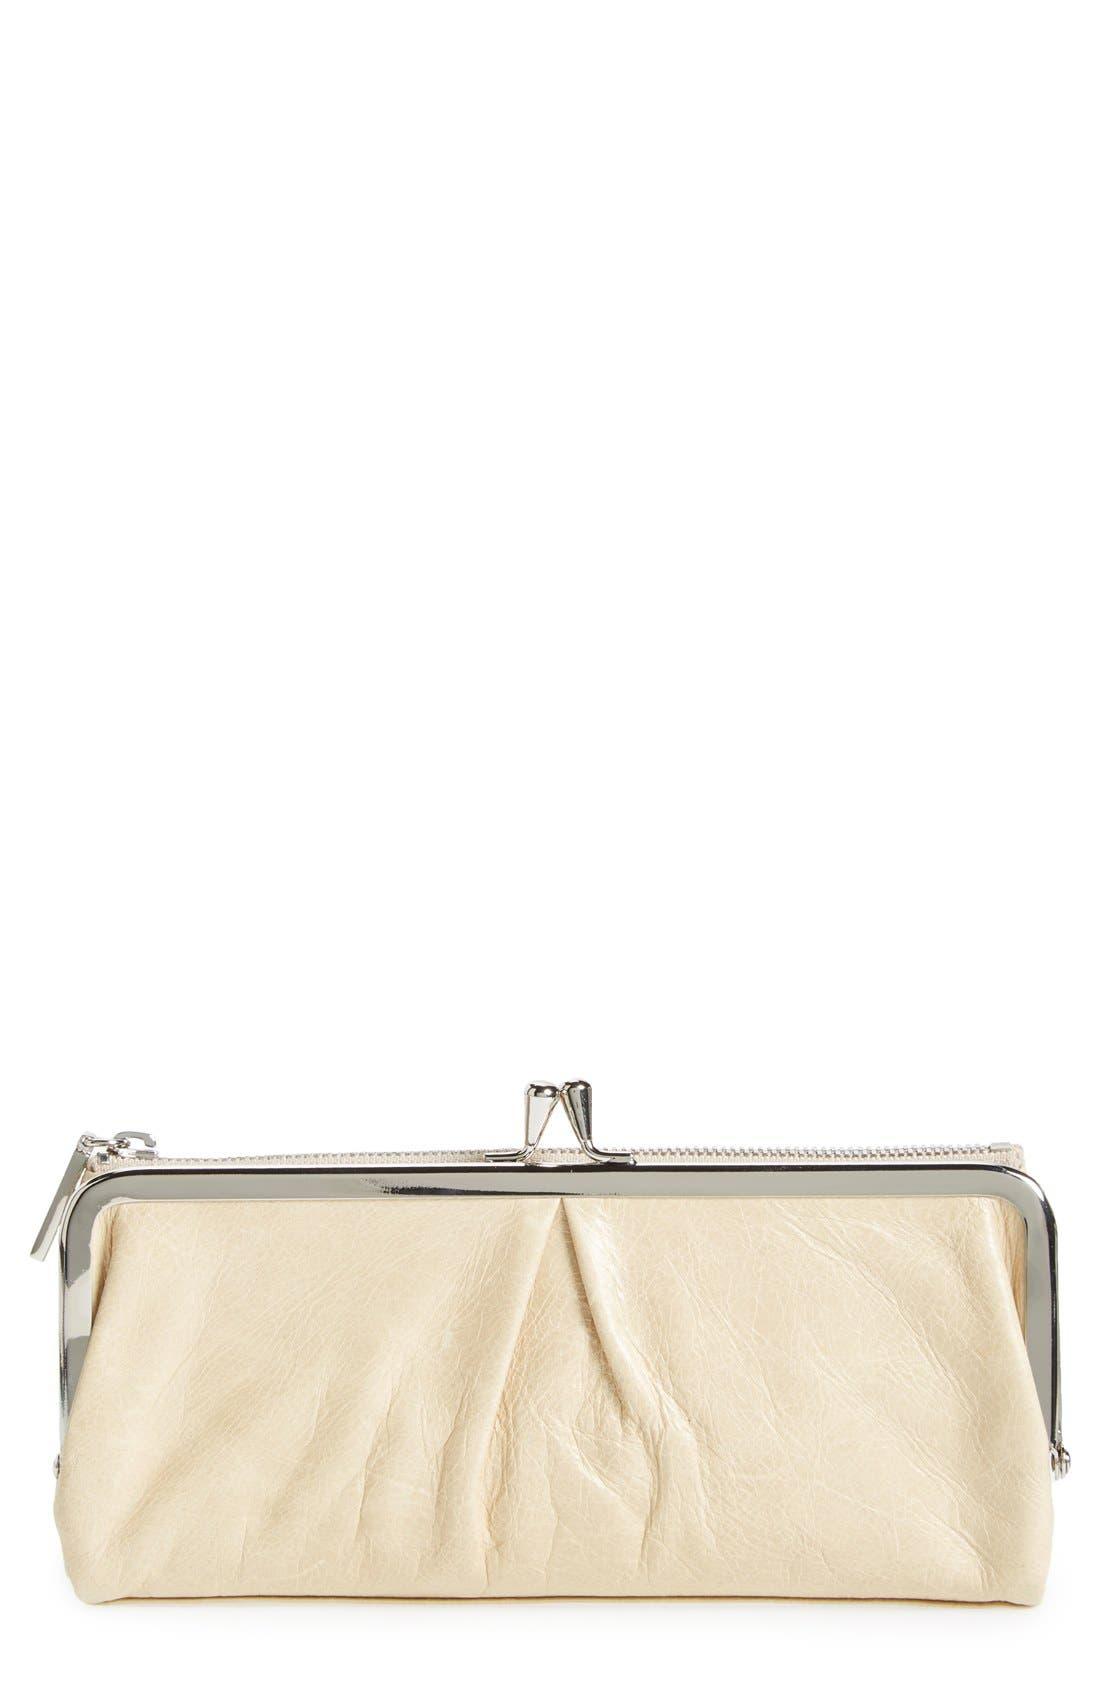 Main Image - Hobo 'Vera' Frame Clutch Wallet